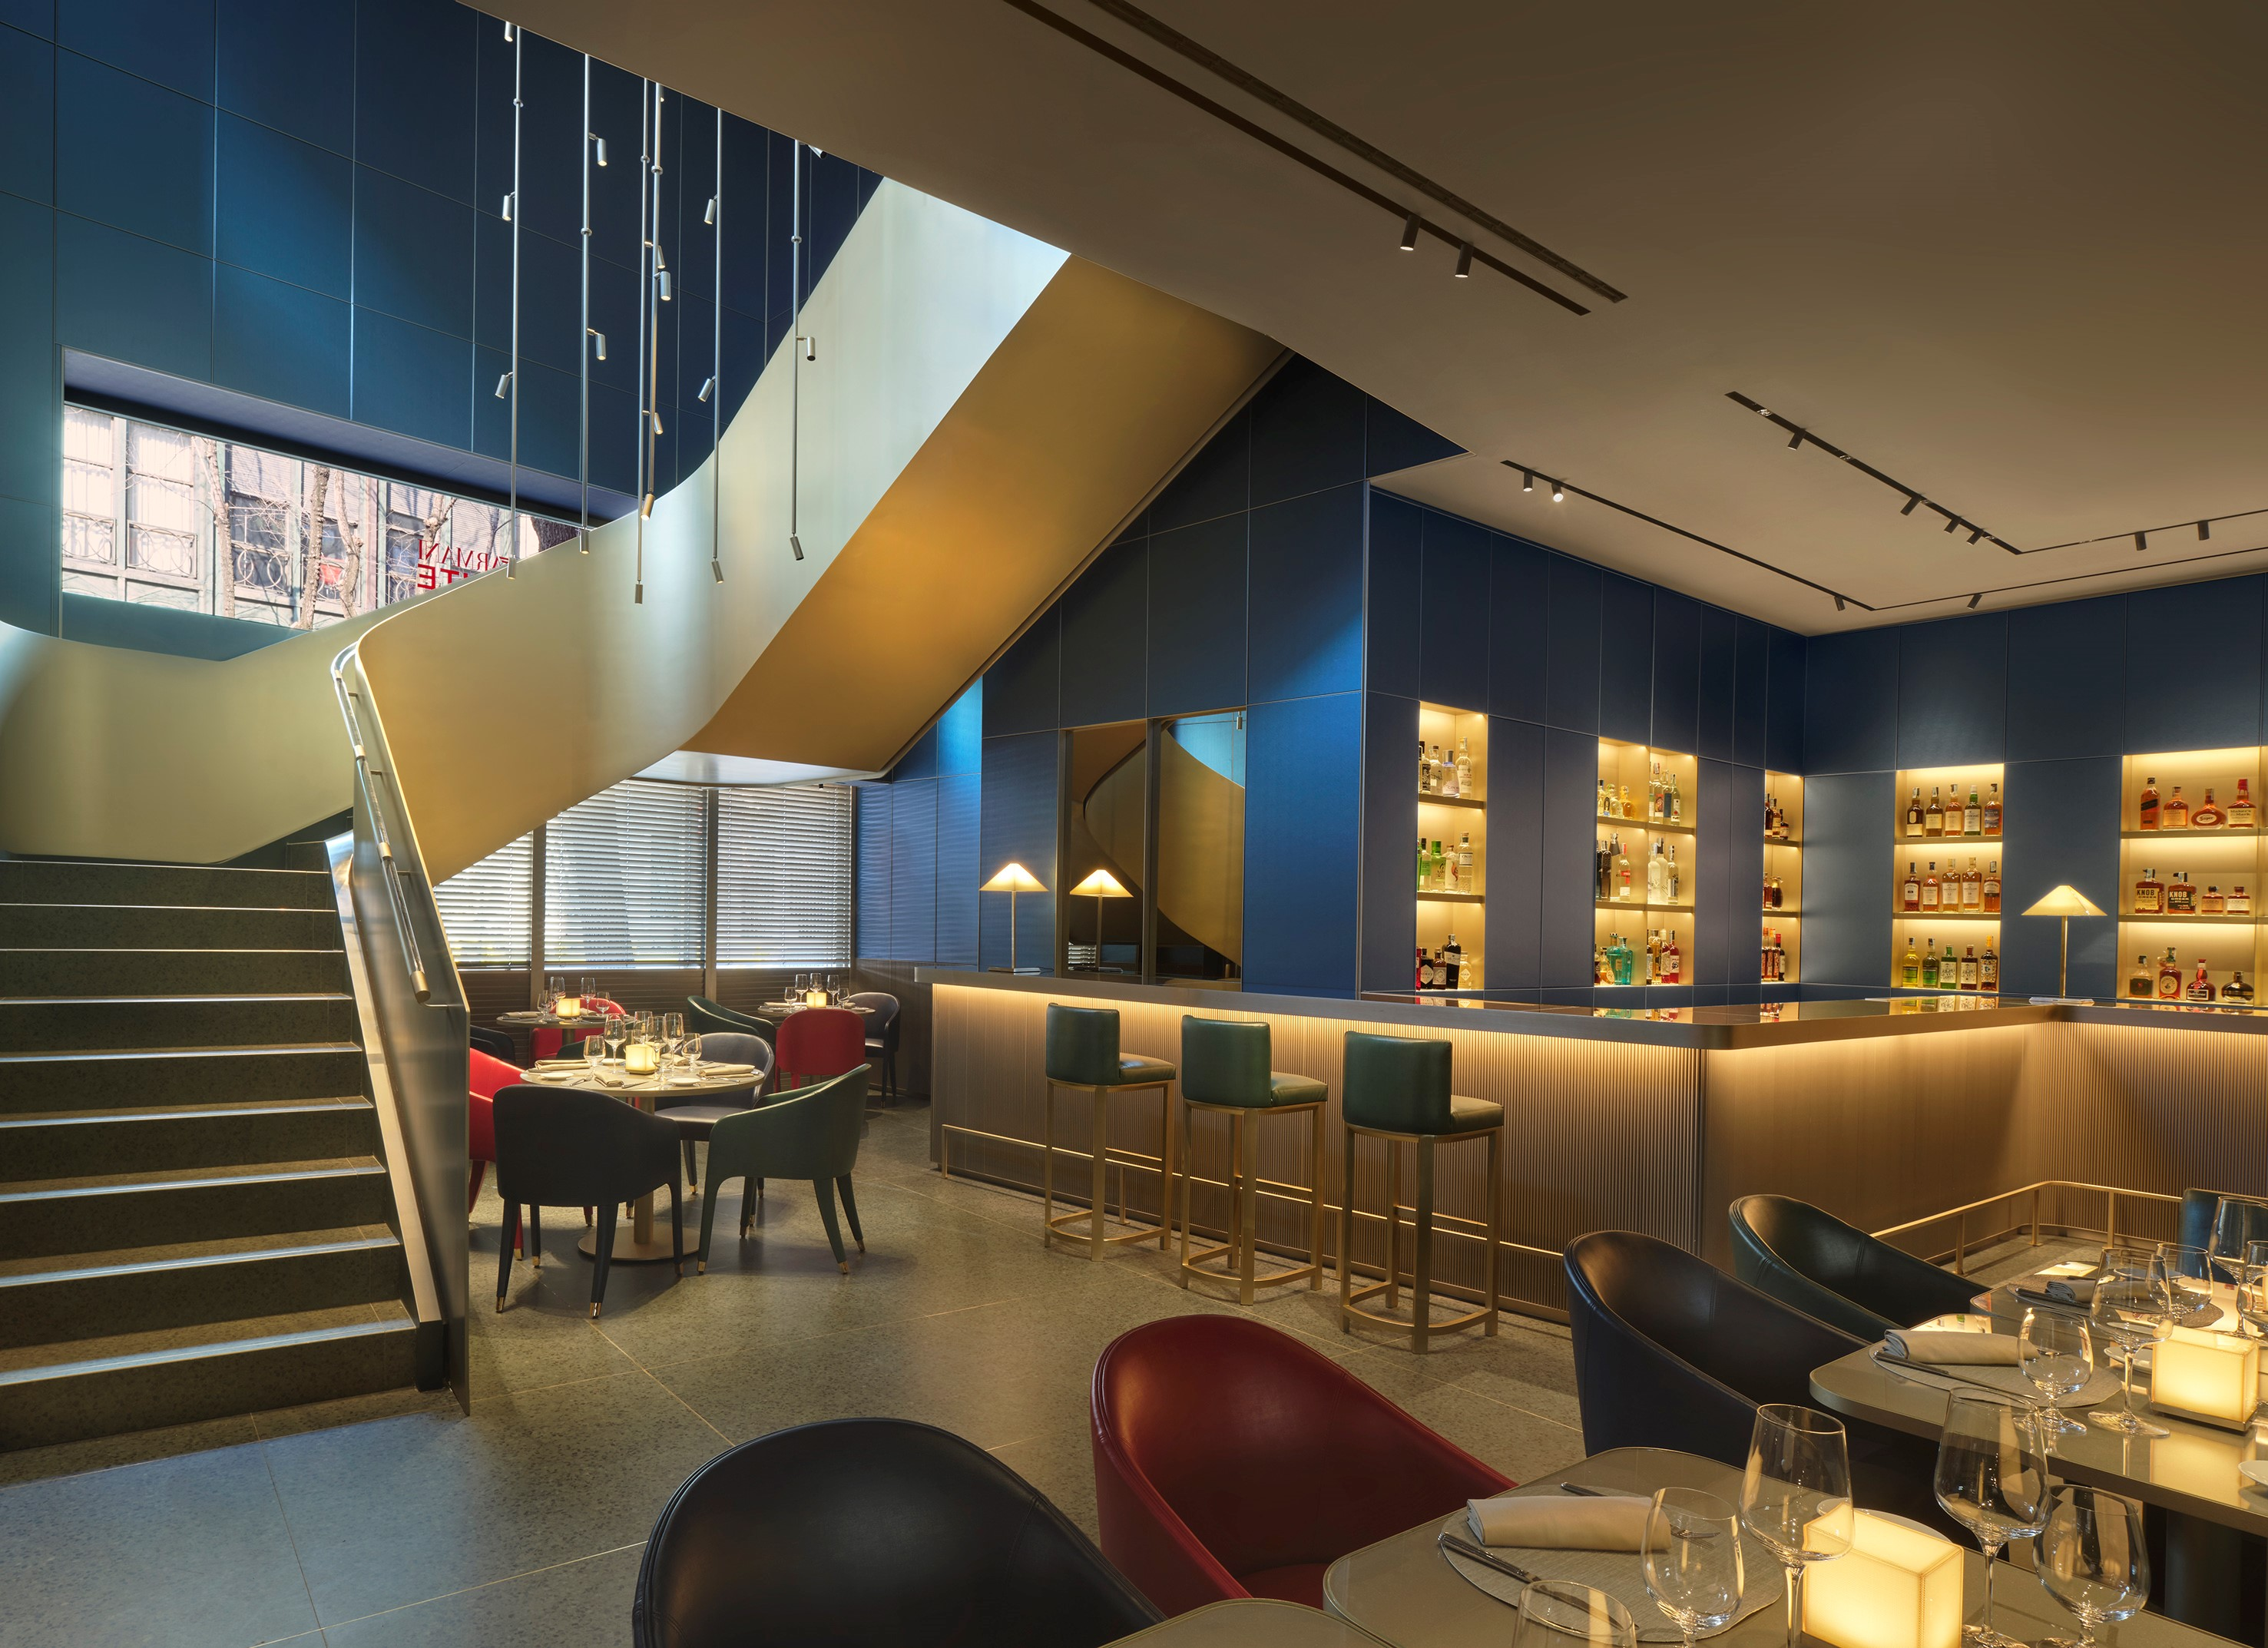 3adea289b Un nouveau concept Emporio Armani Caffè & Ristorante ouvre ses ...